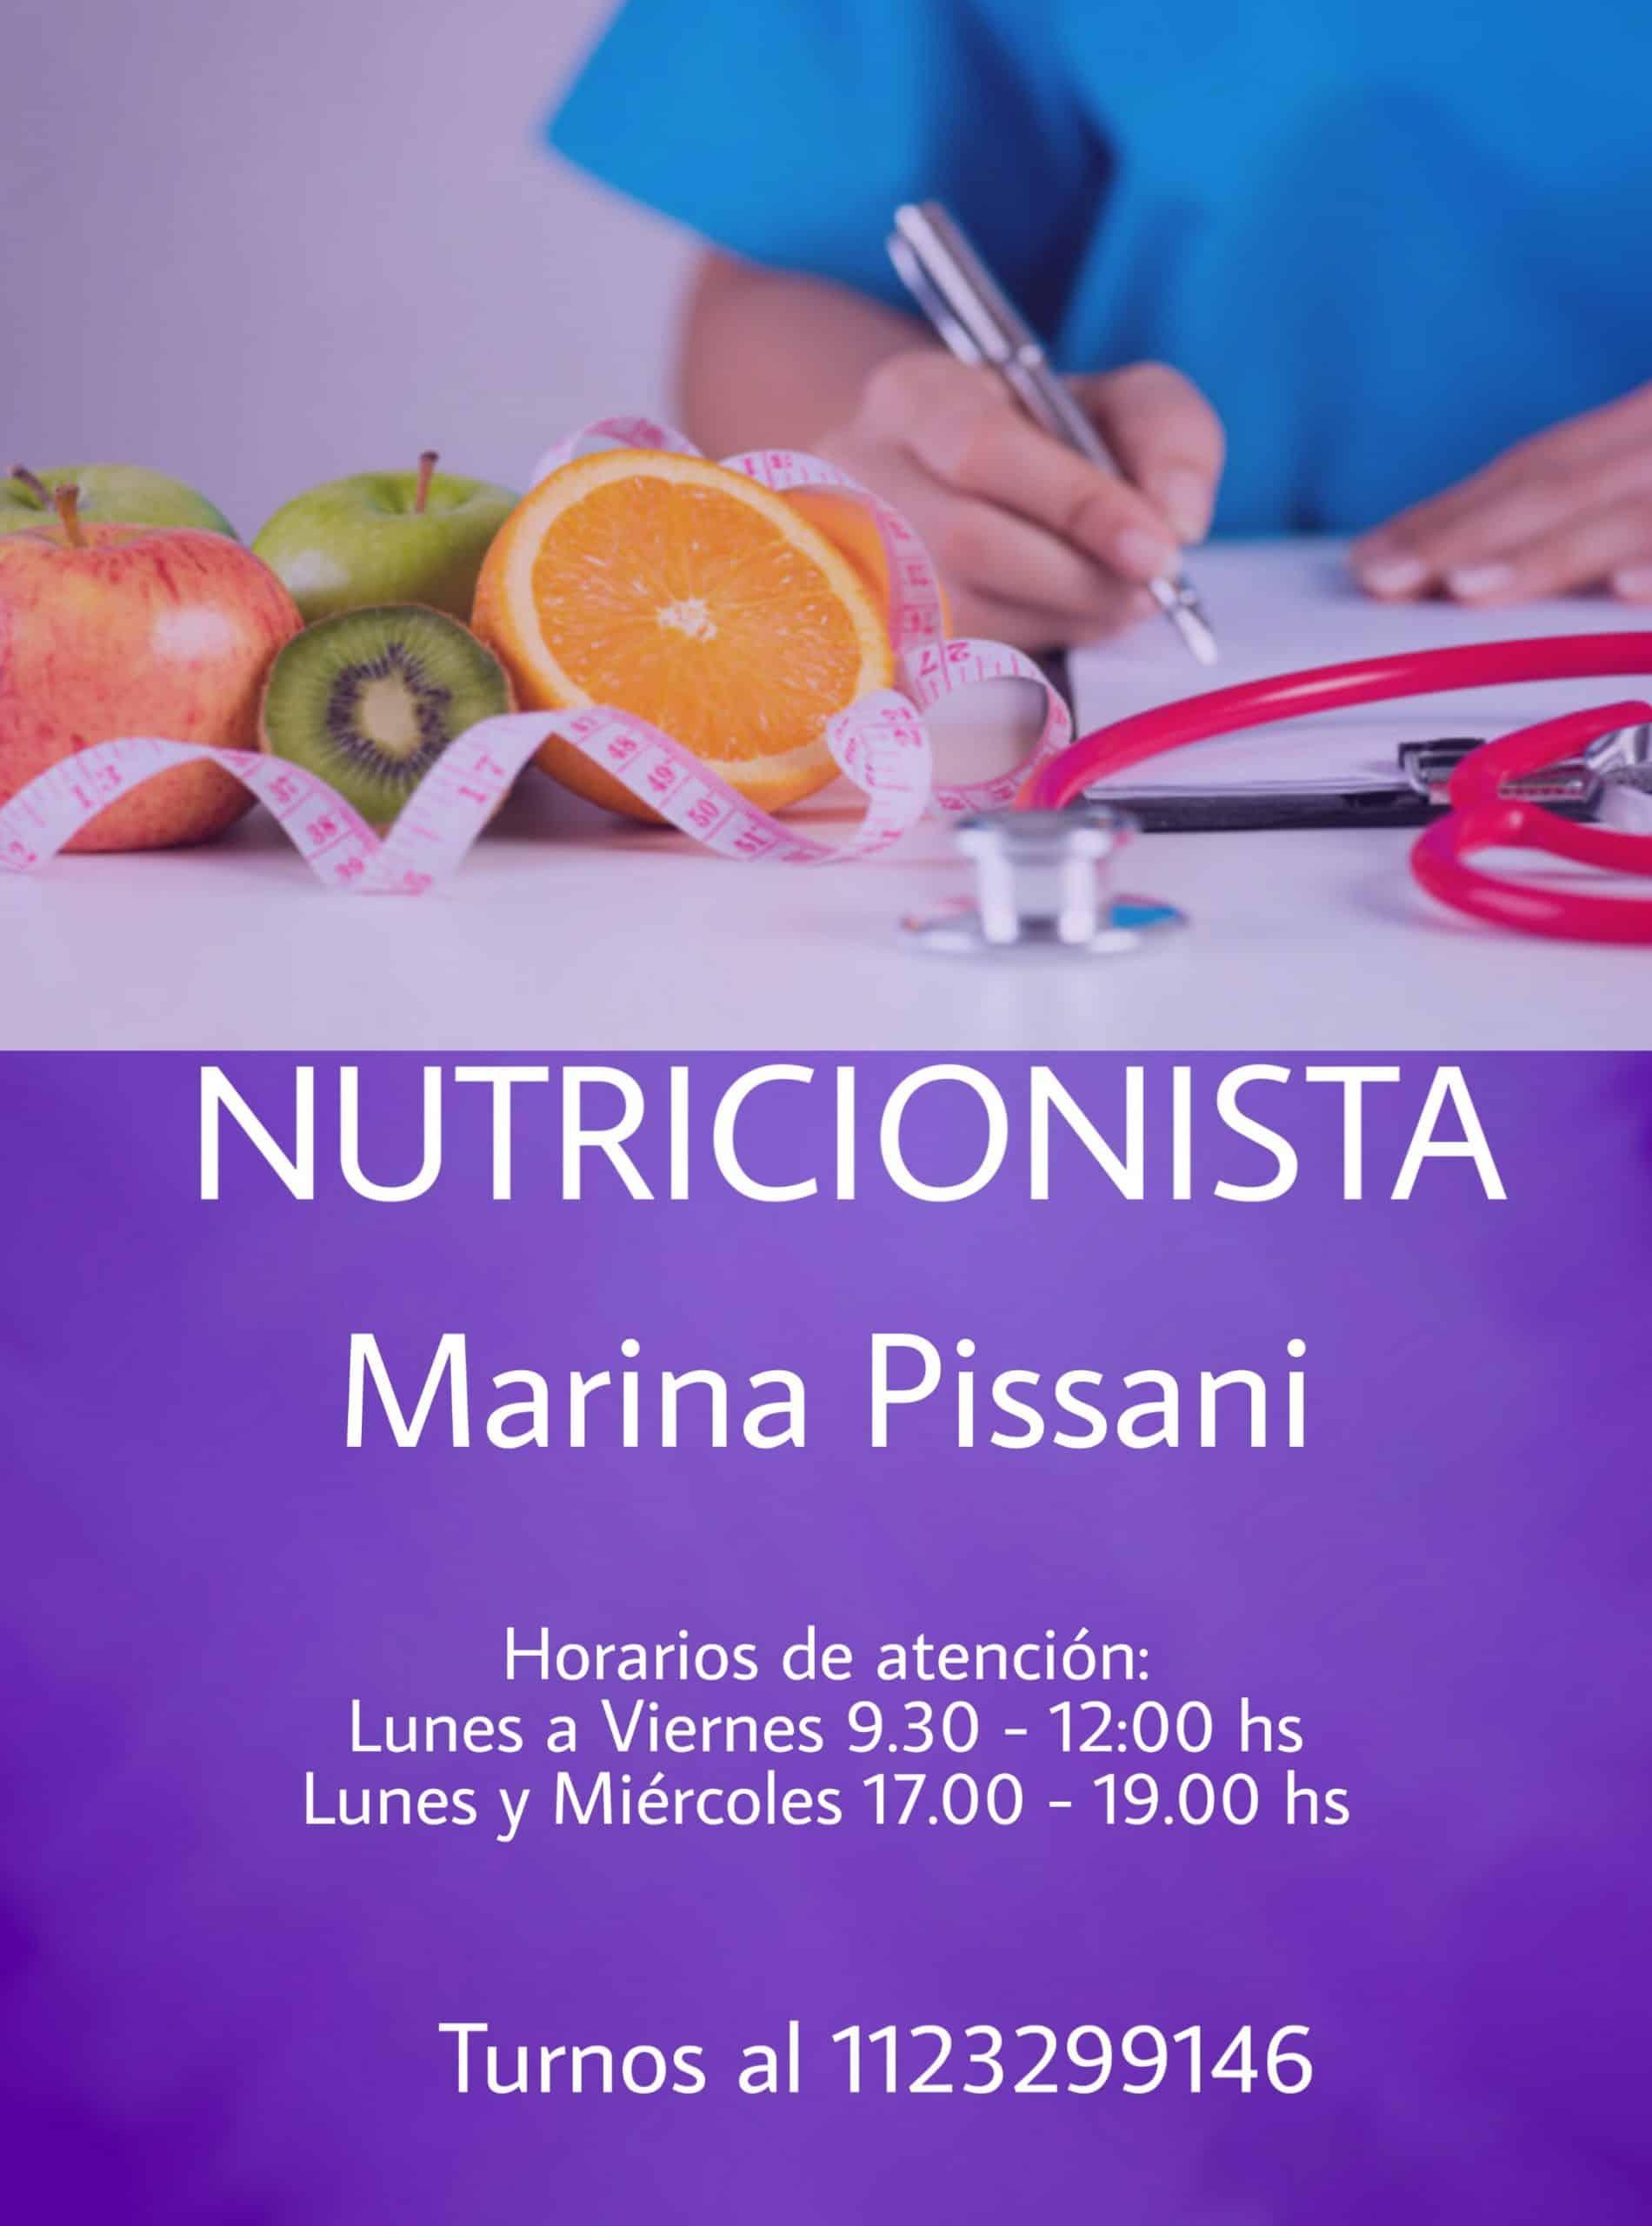 Marina Pissani Nutricionista